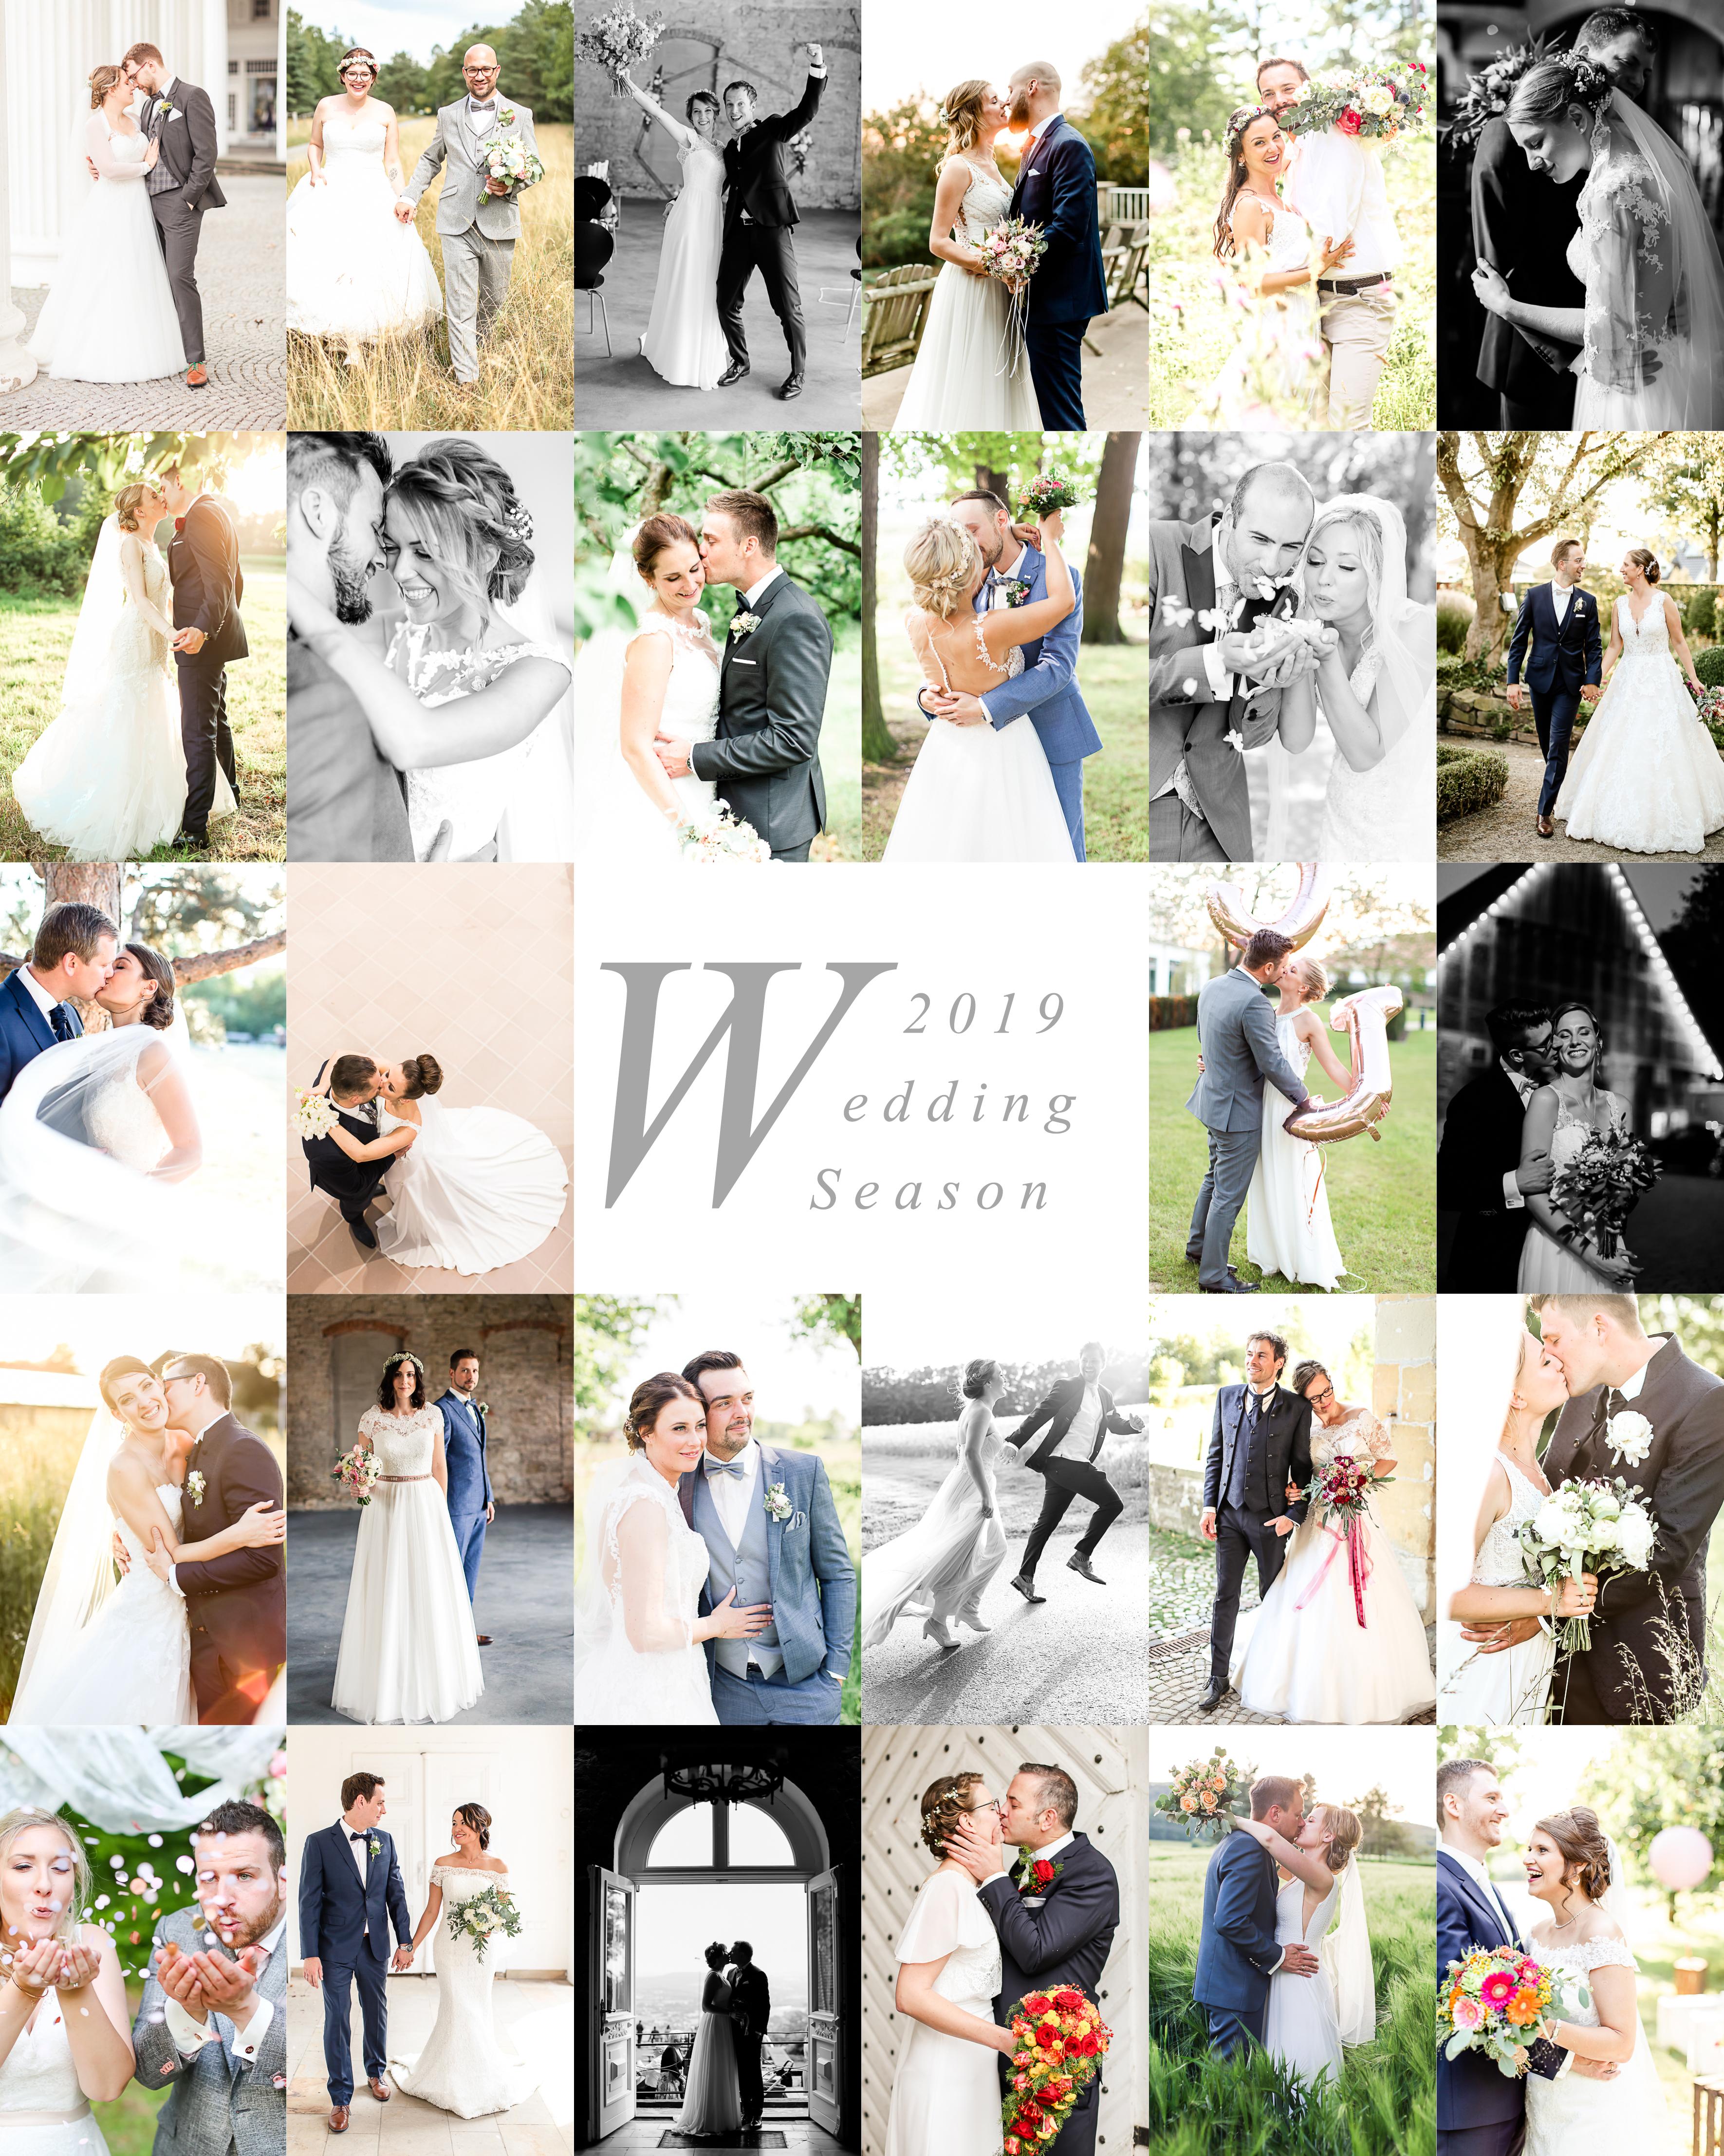 Hochzeitsfotograf-Marco-Huether-2019-150